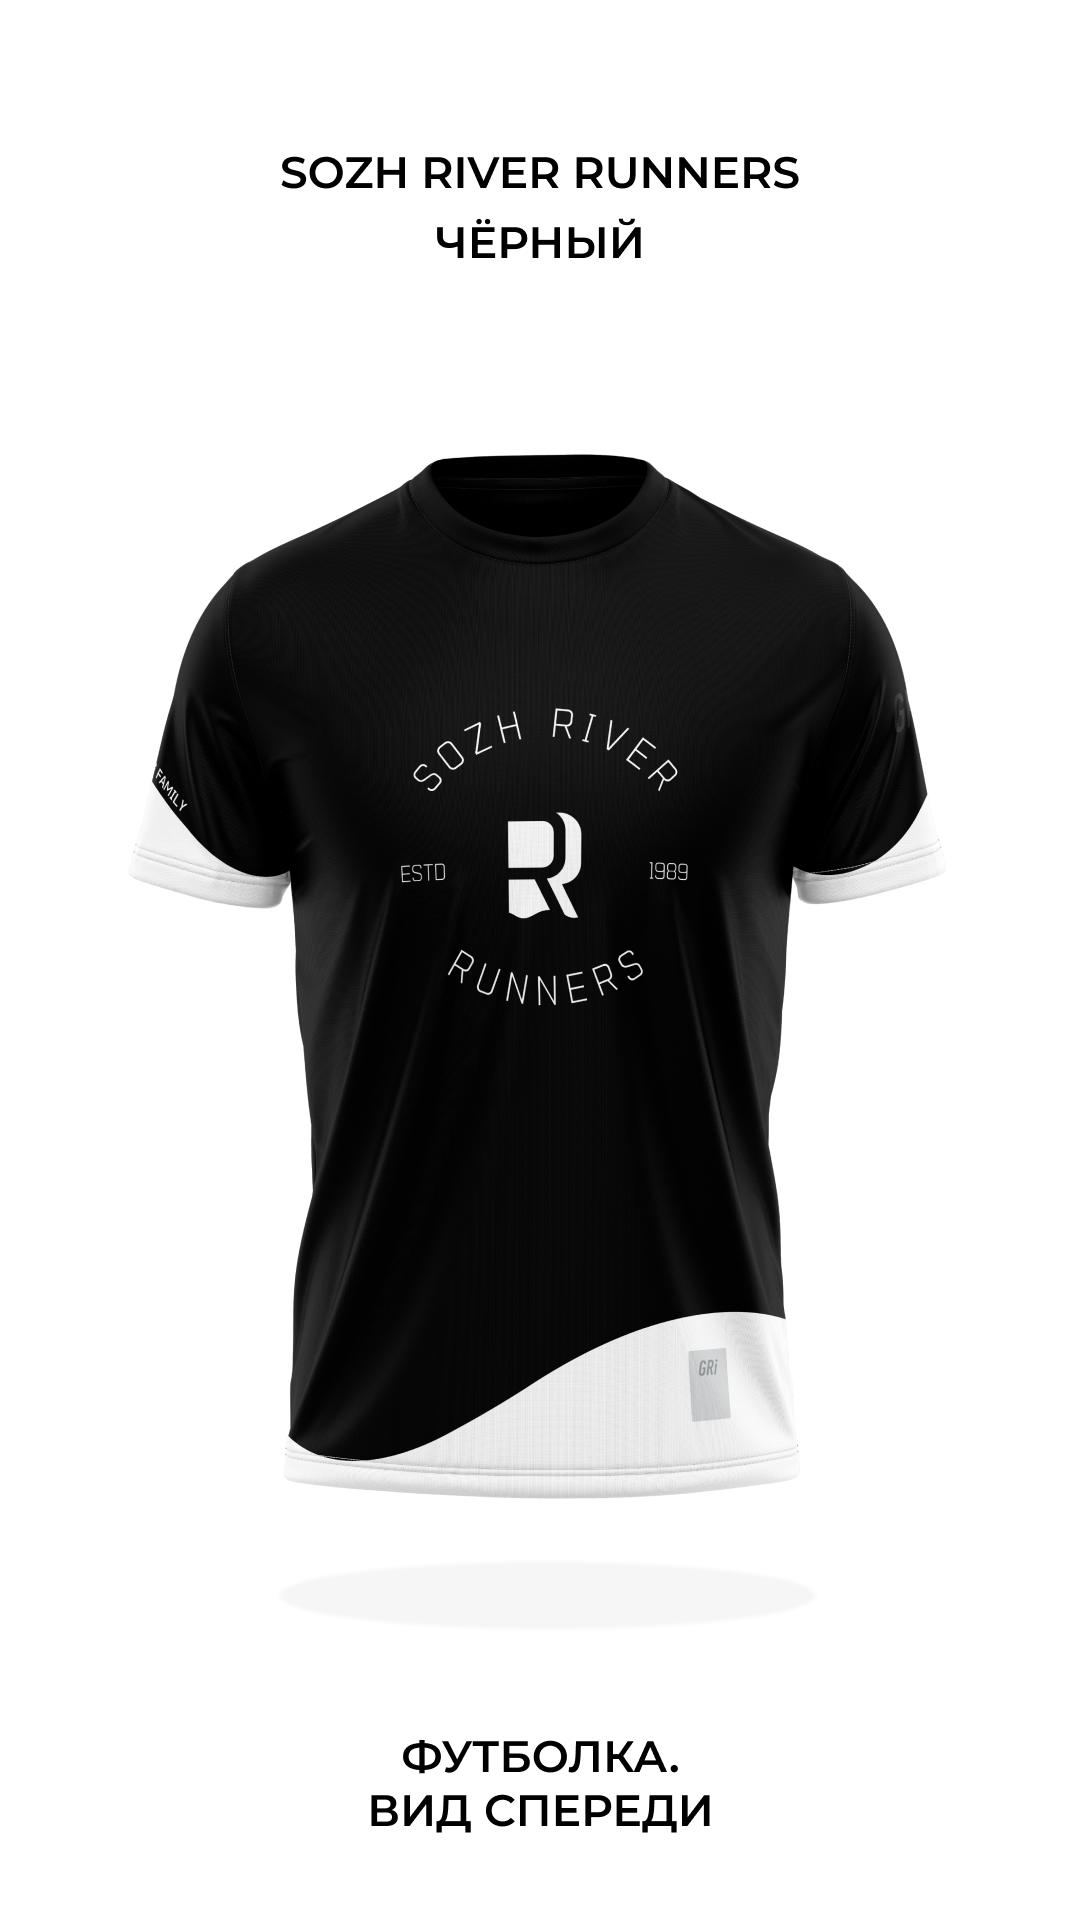 Футболка клубная GRi SRR, черная, мужская